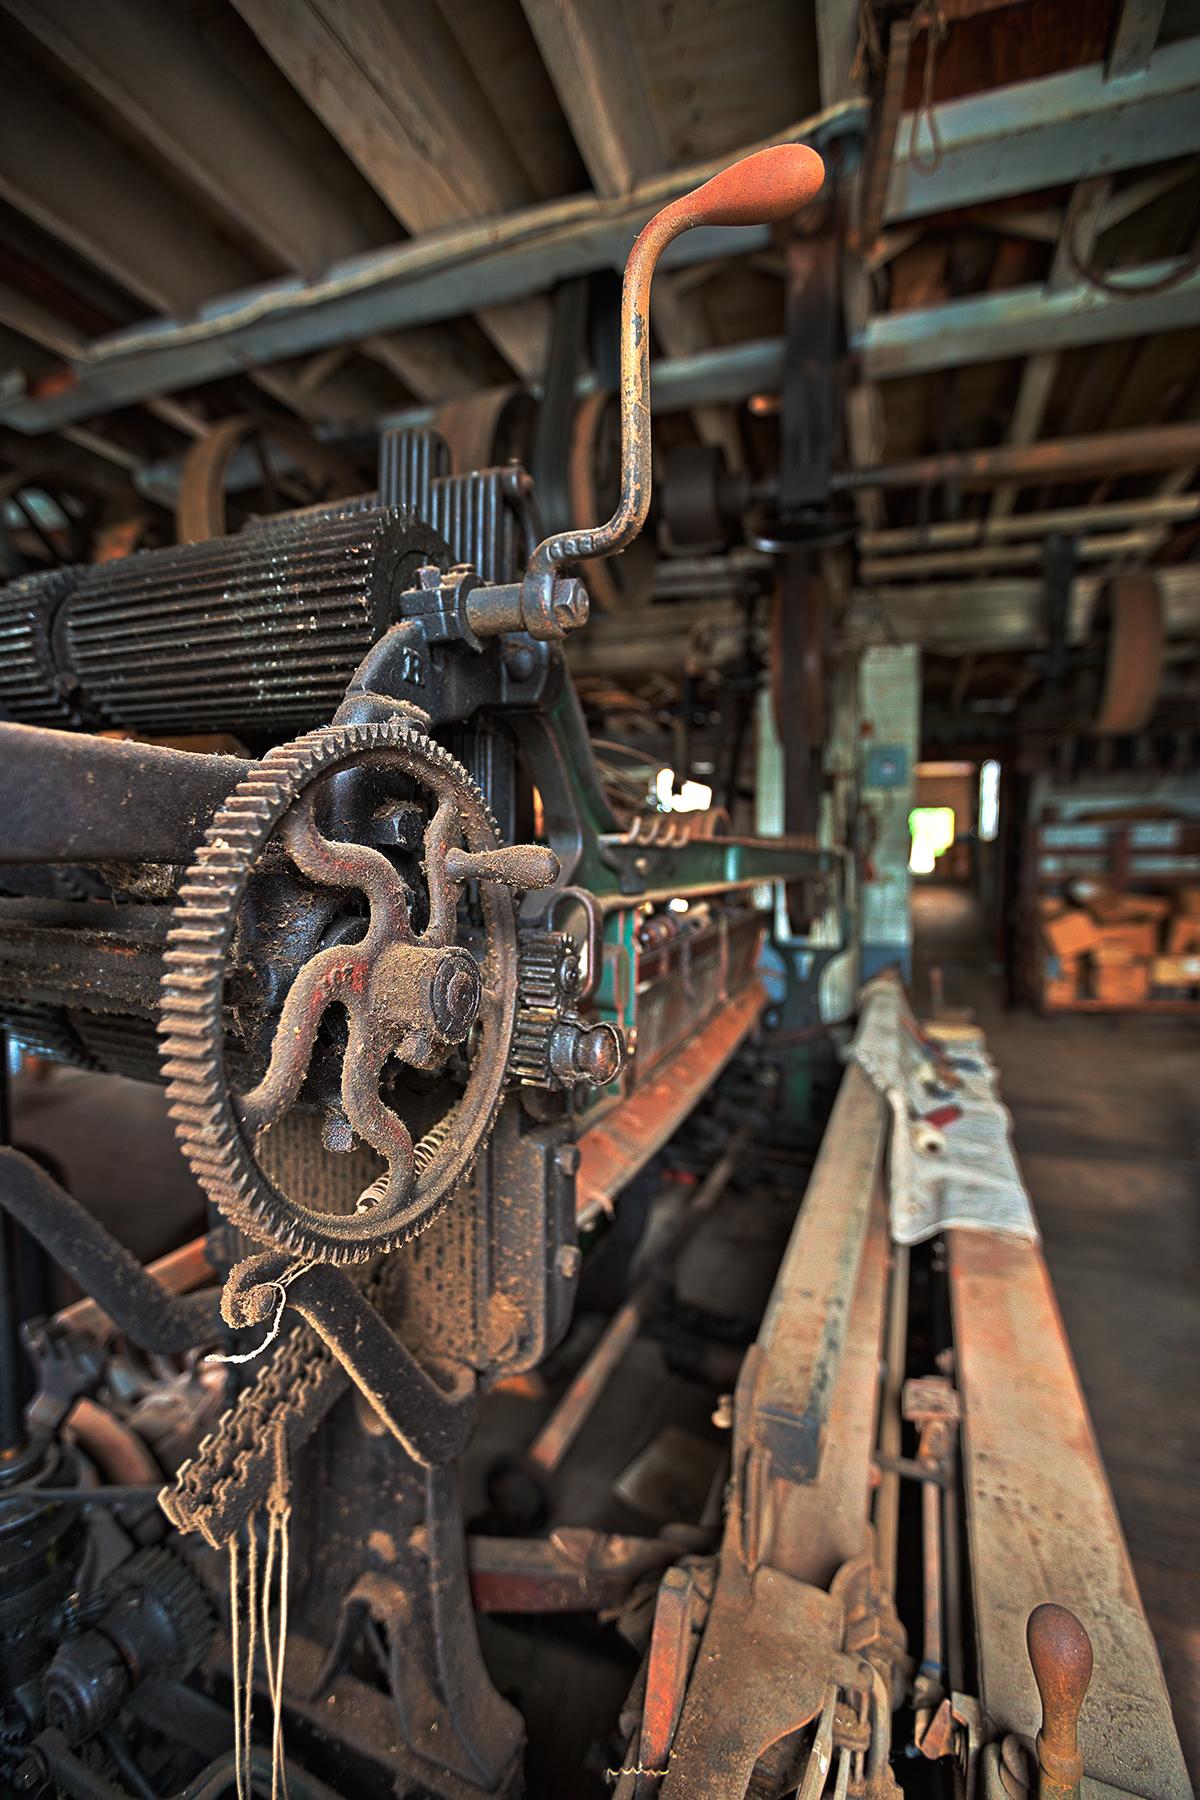 Waterside Woolen Mill - HDR, Abandoned, Of, Scene, Rusty, HQ Photo